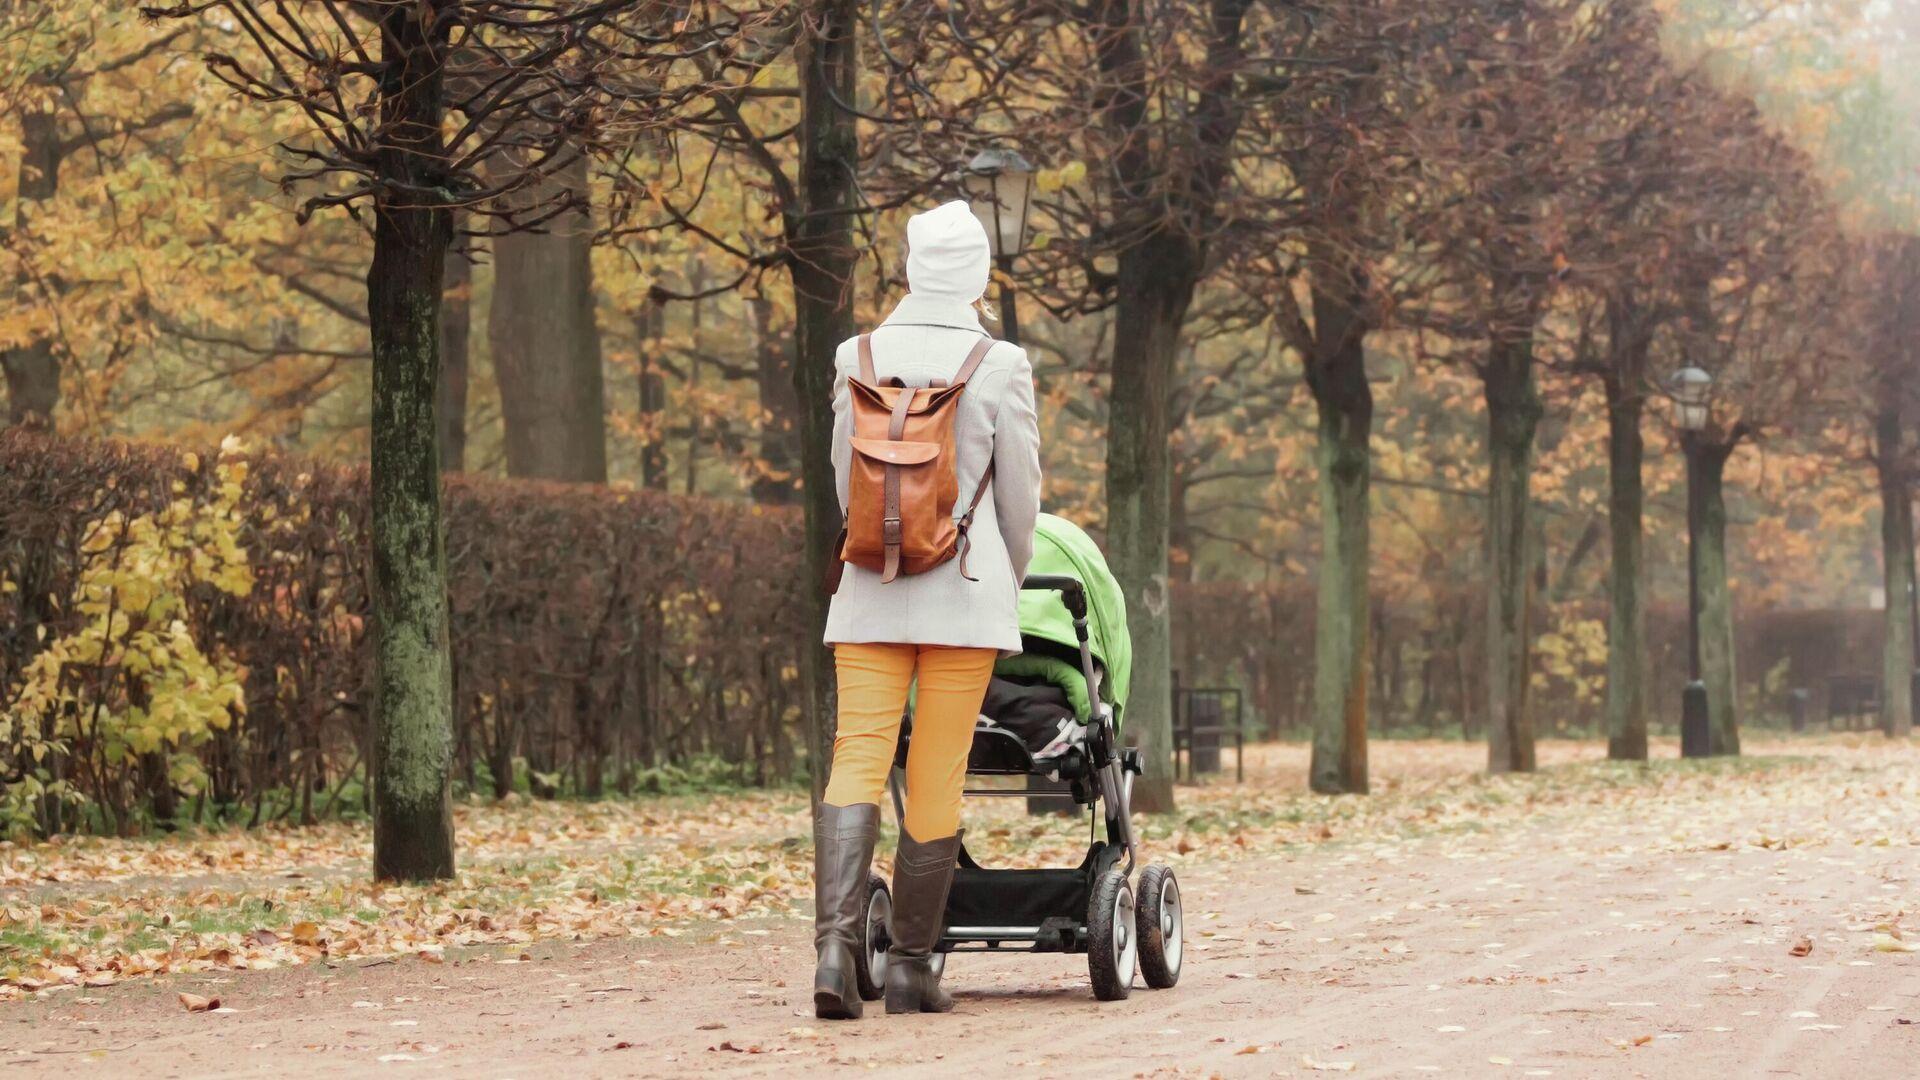 Мама с ребенком на прогулке - РИА Новости, 1920, 27.10.2020